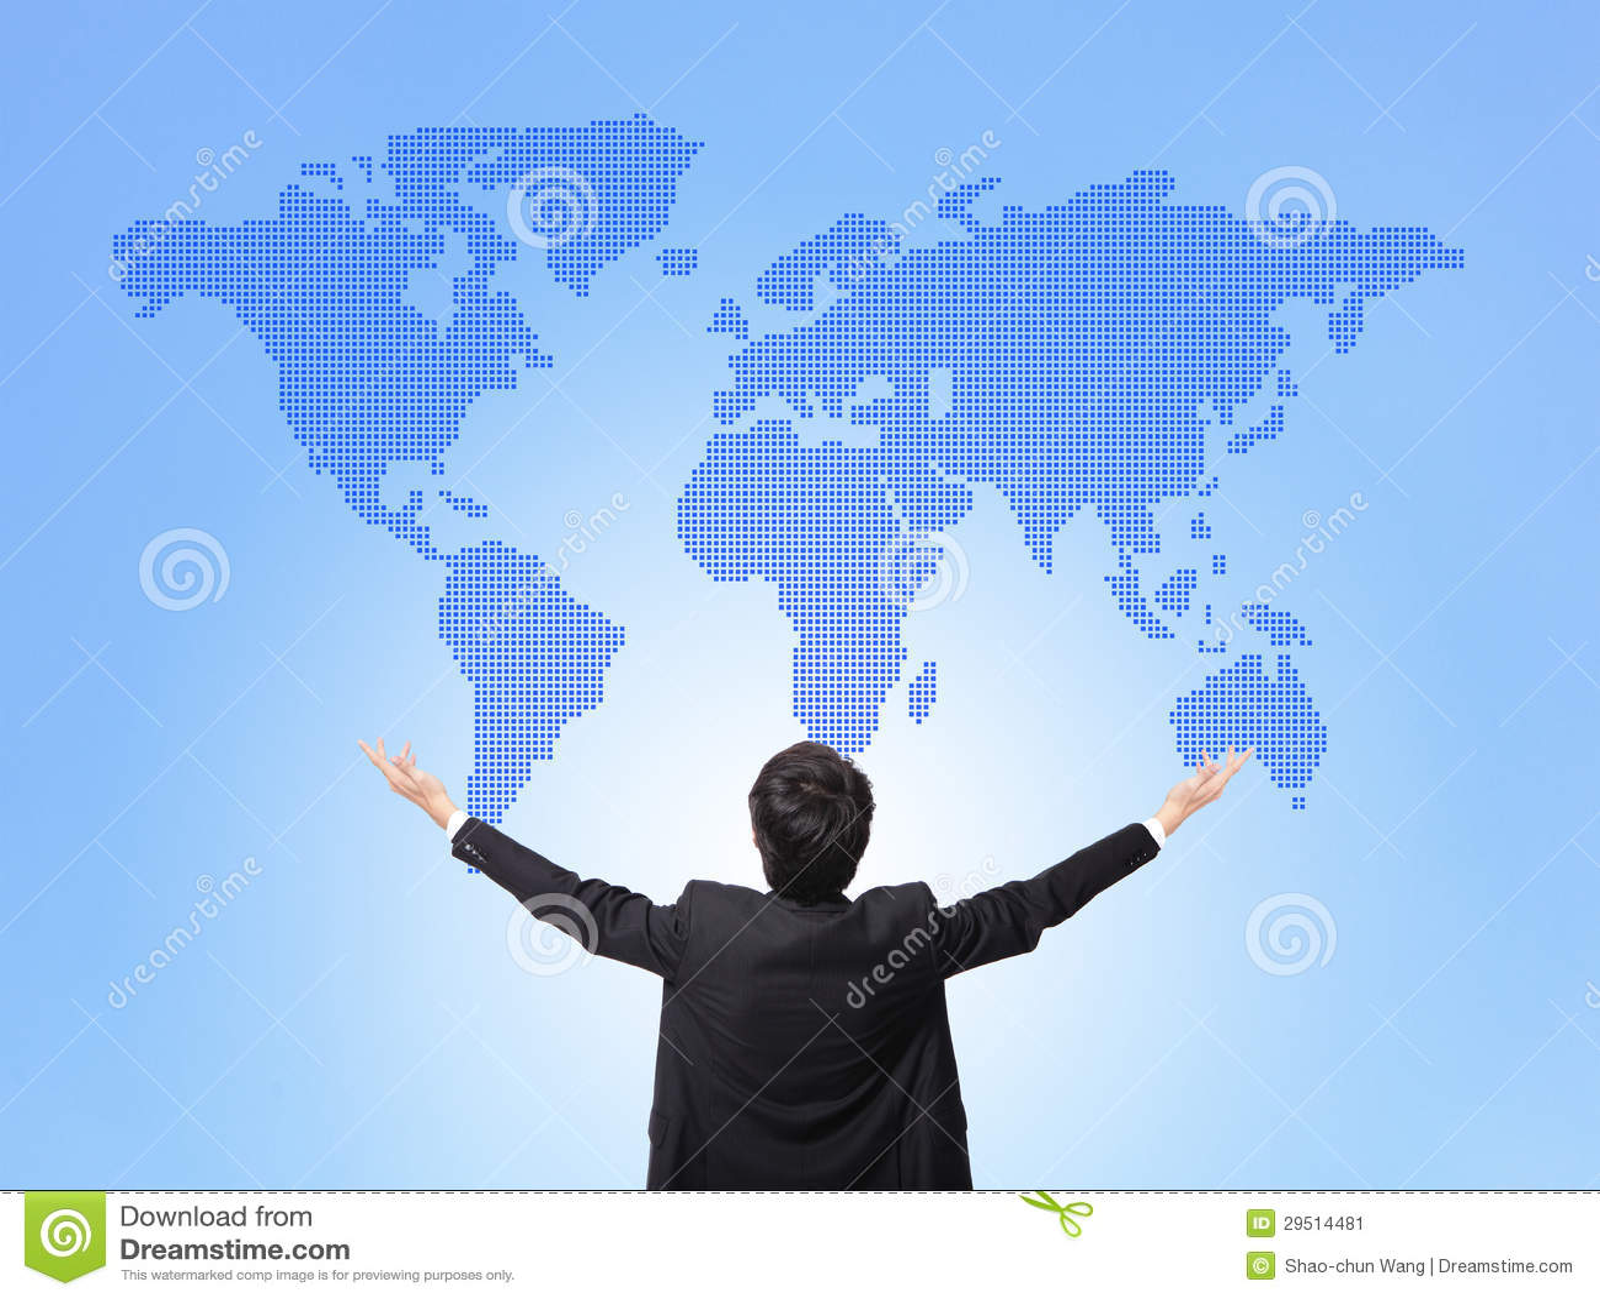 Map The Hug Business Man Hug Global Map Stock Image   Image of happy